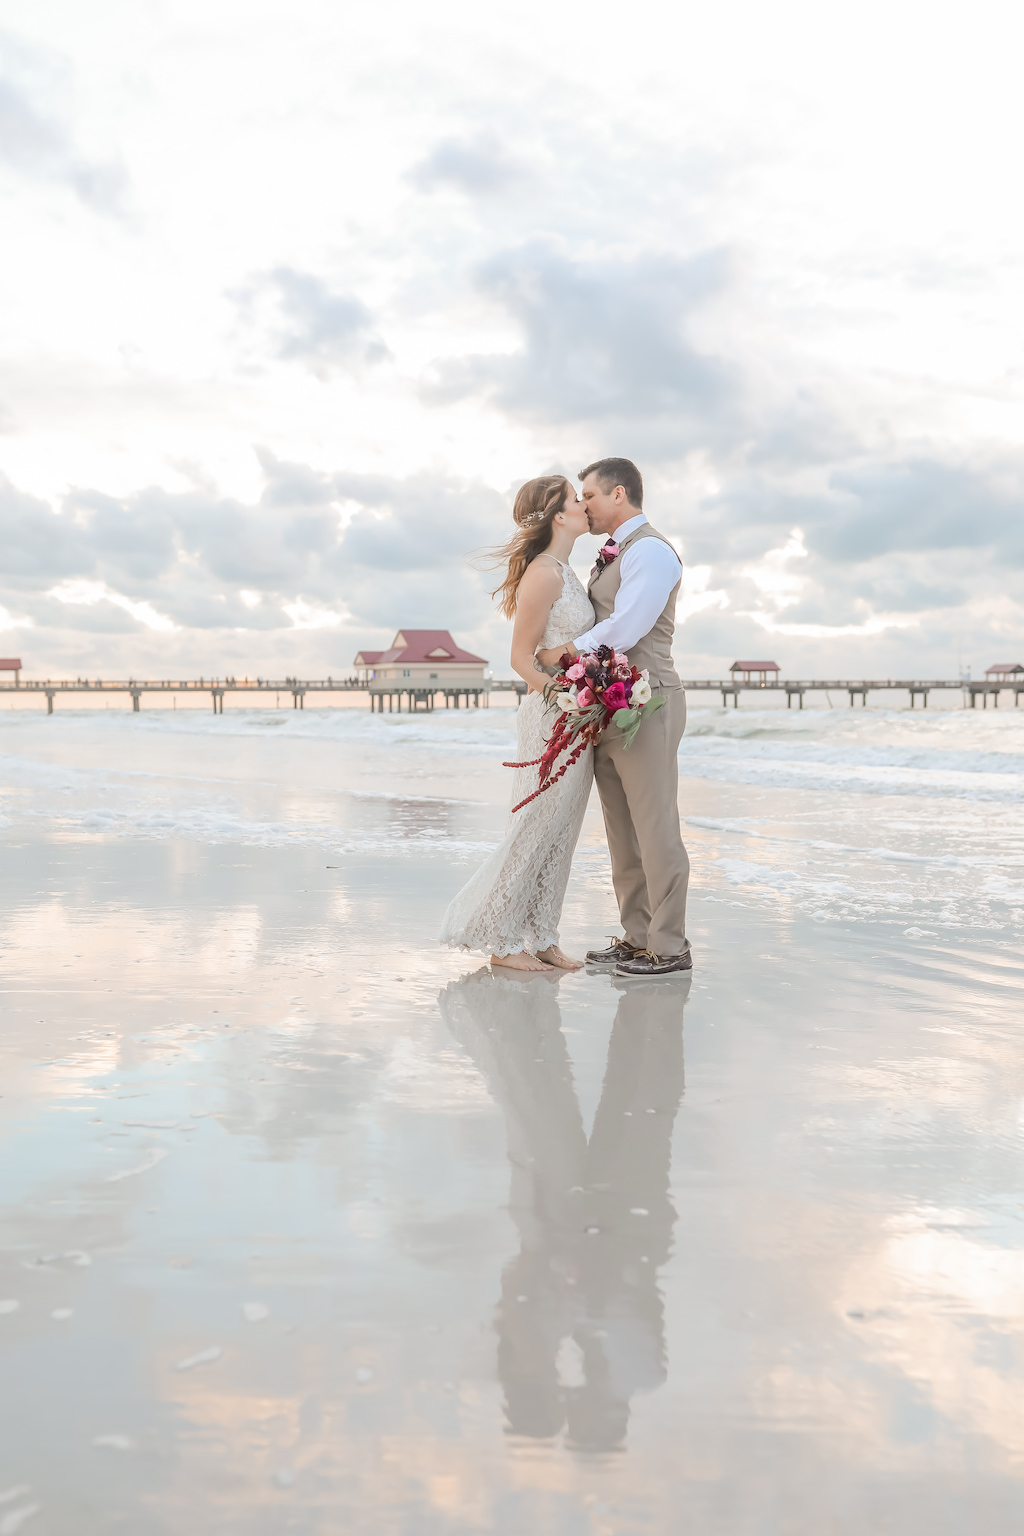 Florida Bride and Groom Sunset Wedding Portrait on the Beach | Tampa Bay Wedding Photographer Lifelong Photography Studios | Clearwater Beach Hotel Wedding Venue Hilton Clearwater Beach